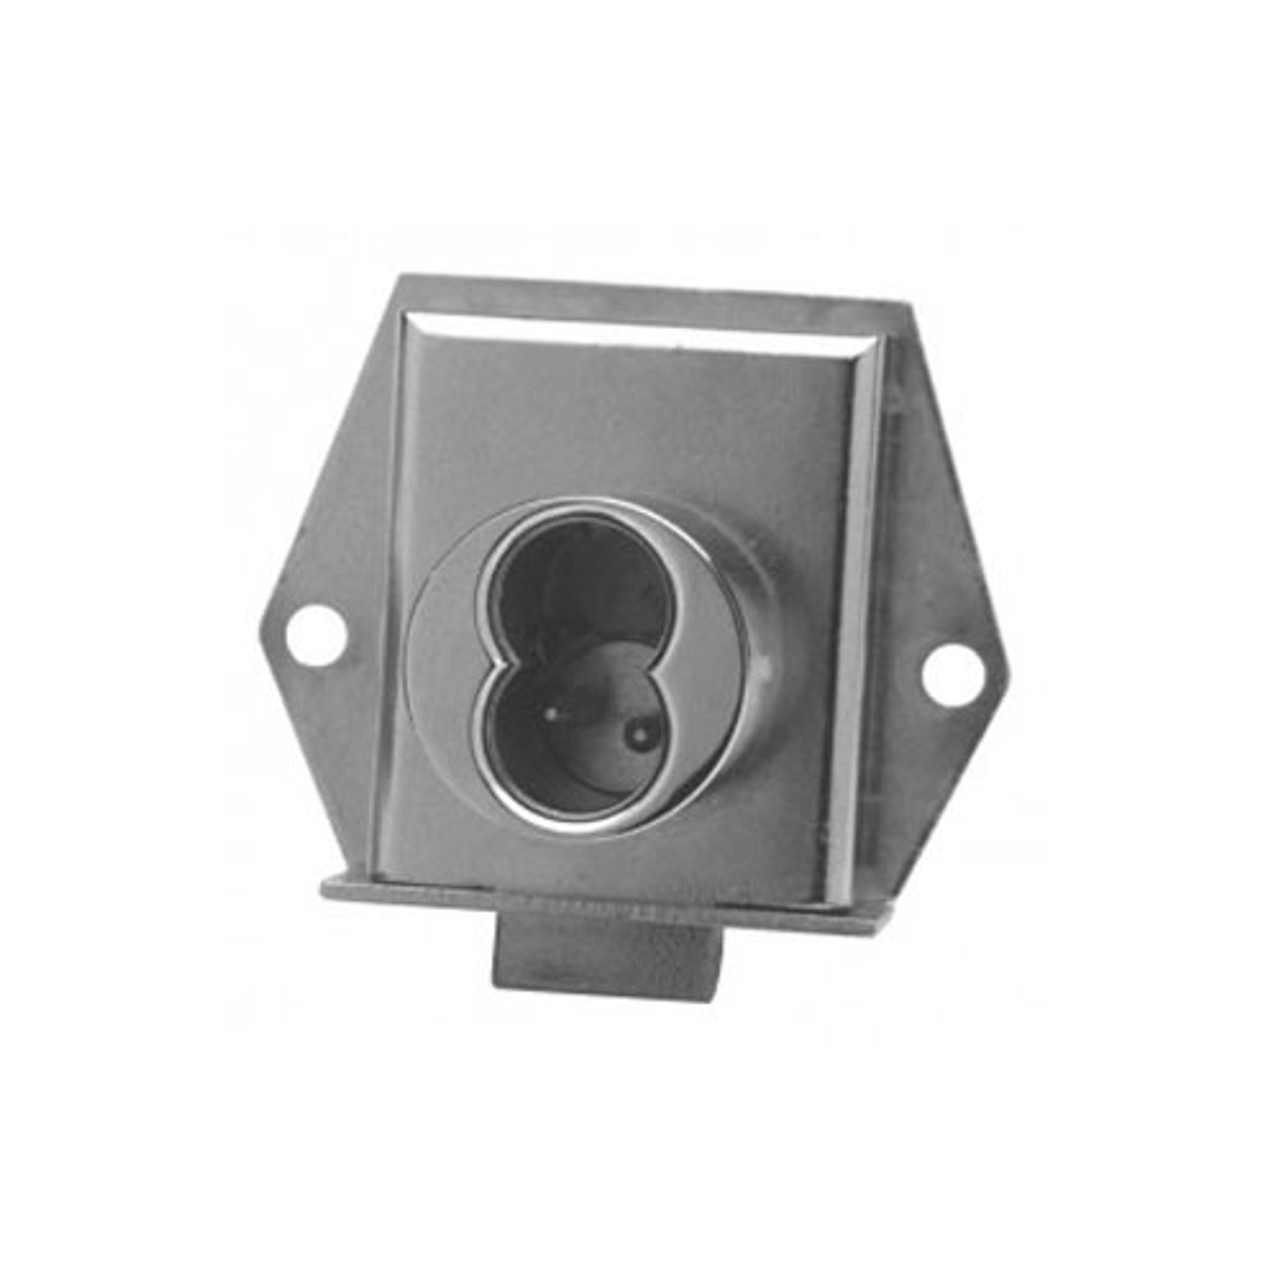 Olympus 725ML-DR-RH-26D Cabinet Locks in Satin Chrome Finish